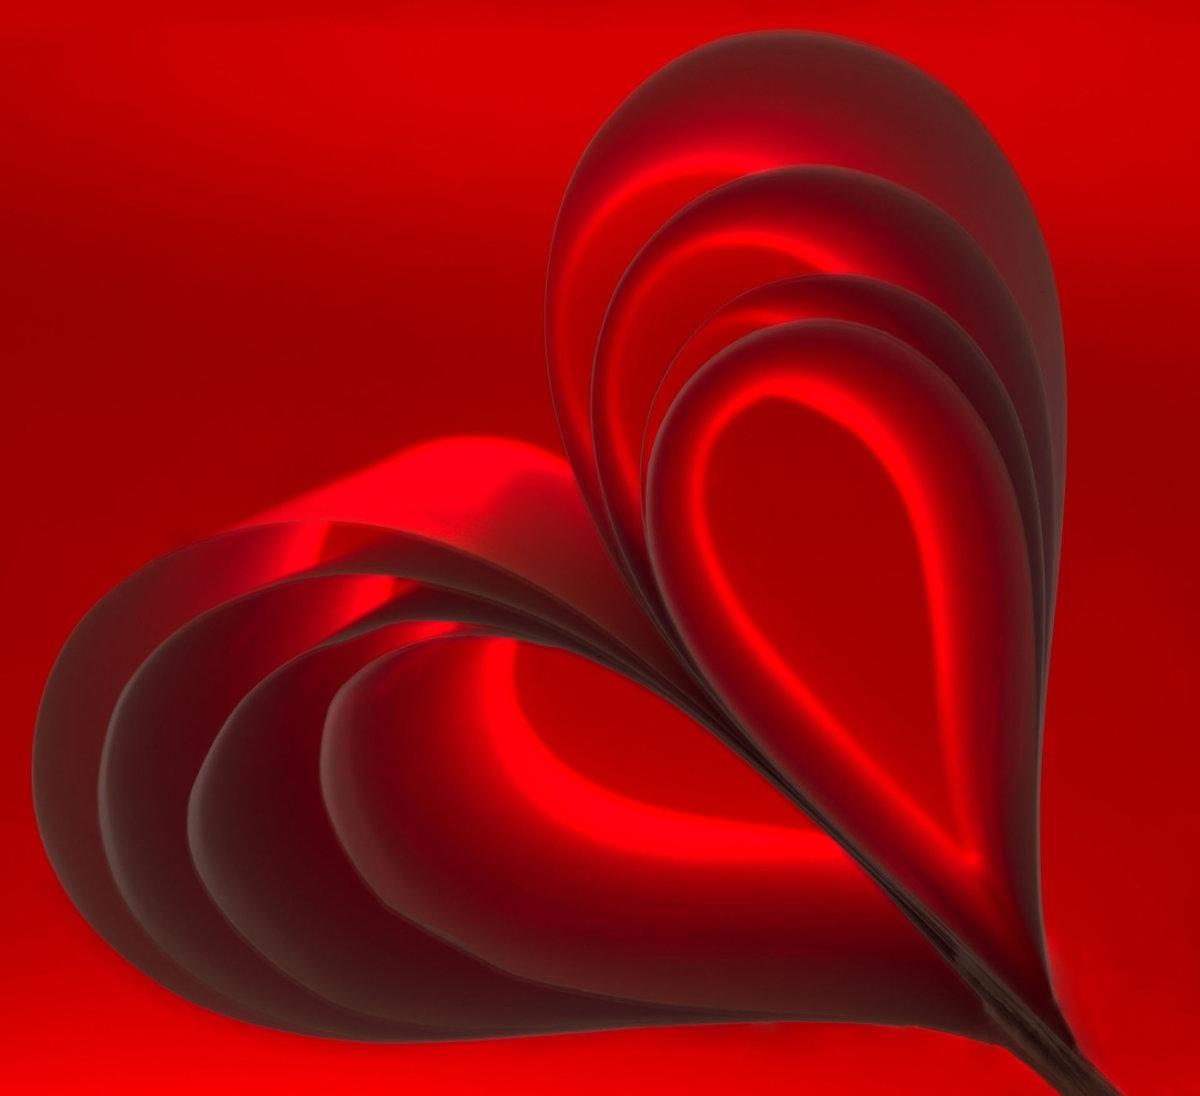 Paper-Heart-CB-1-Place-by-Alice-Ann-Whiteneck-CC